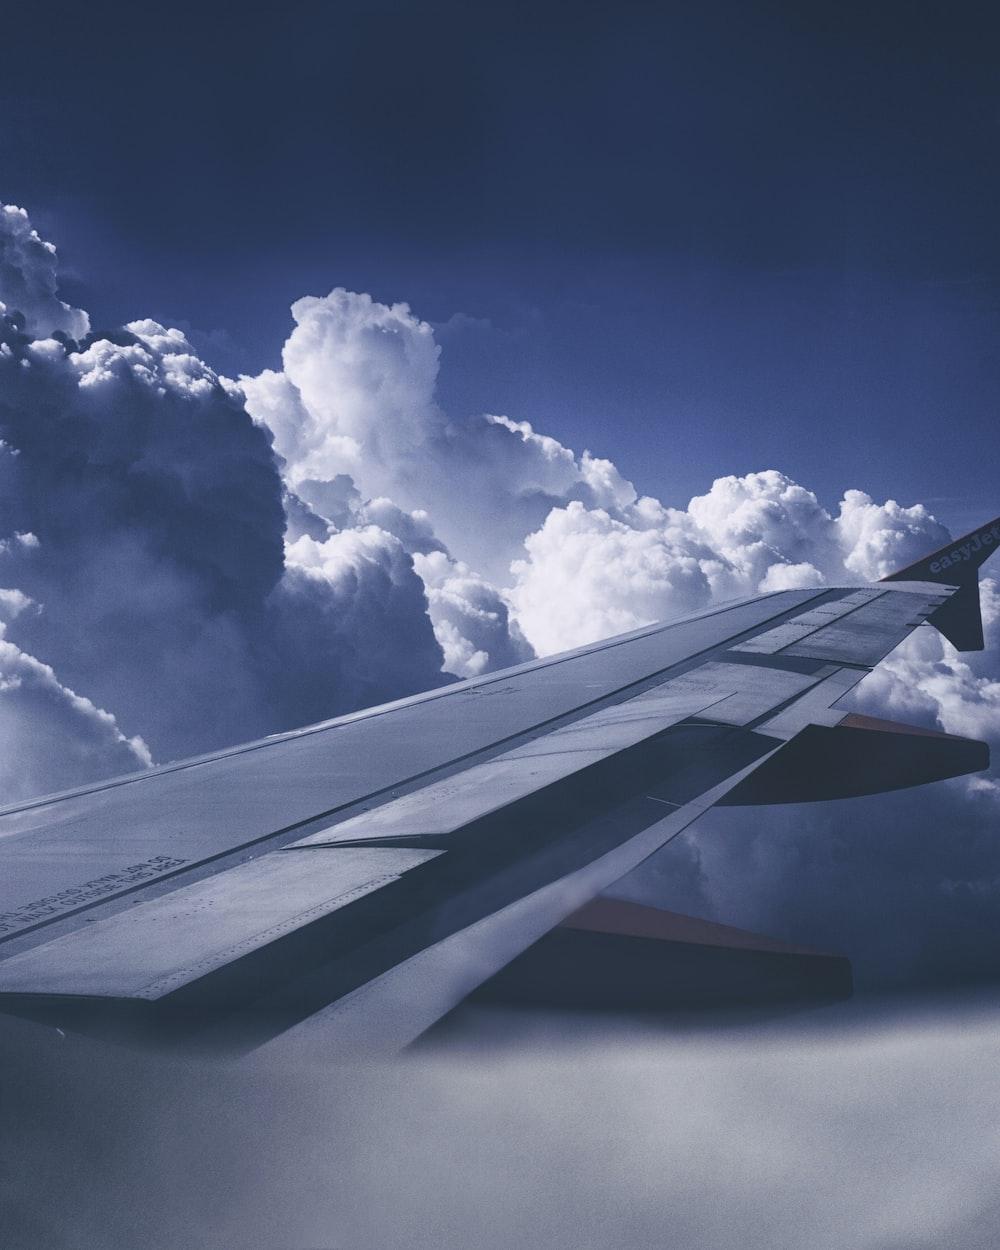 gray plane